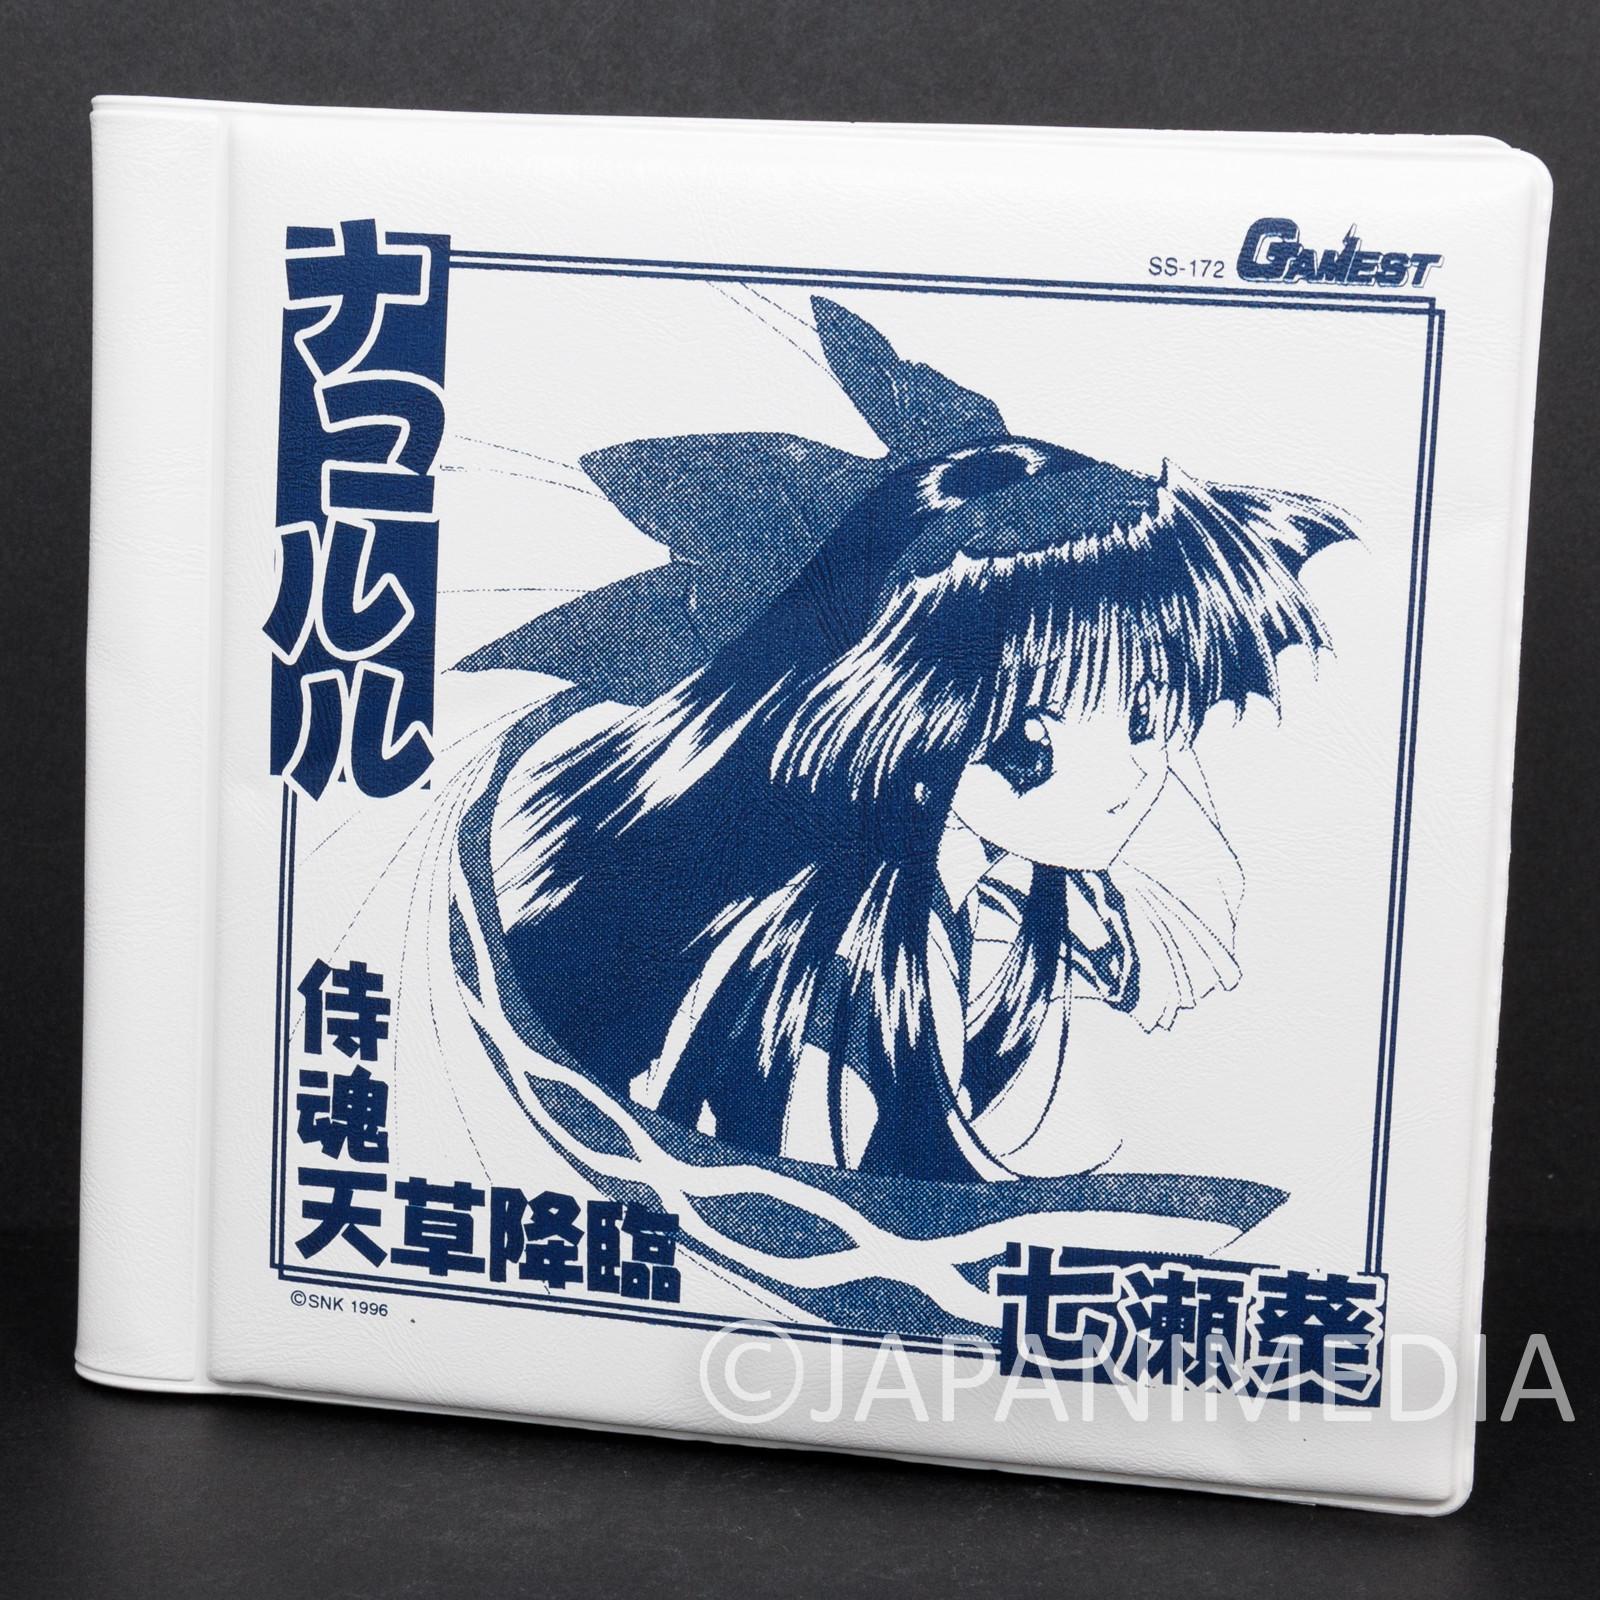 Samurai Shodown Nakoruru CD Disk Case Holder GAMEST SNK SPIRITS